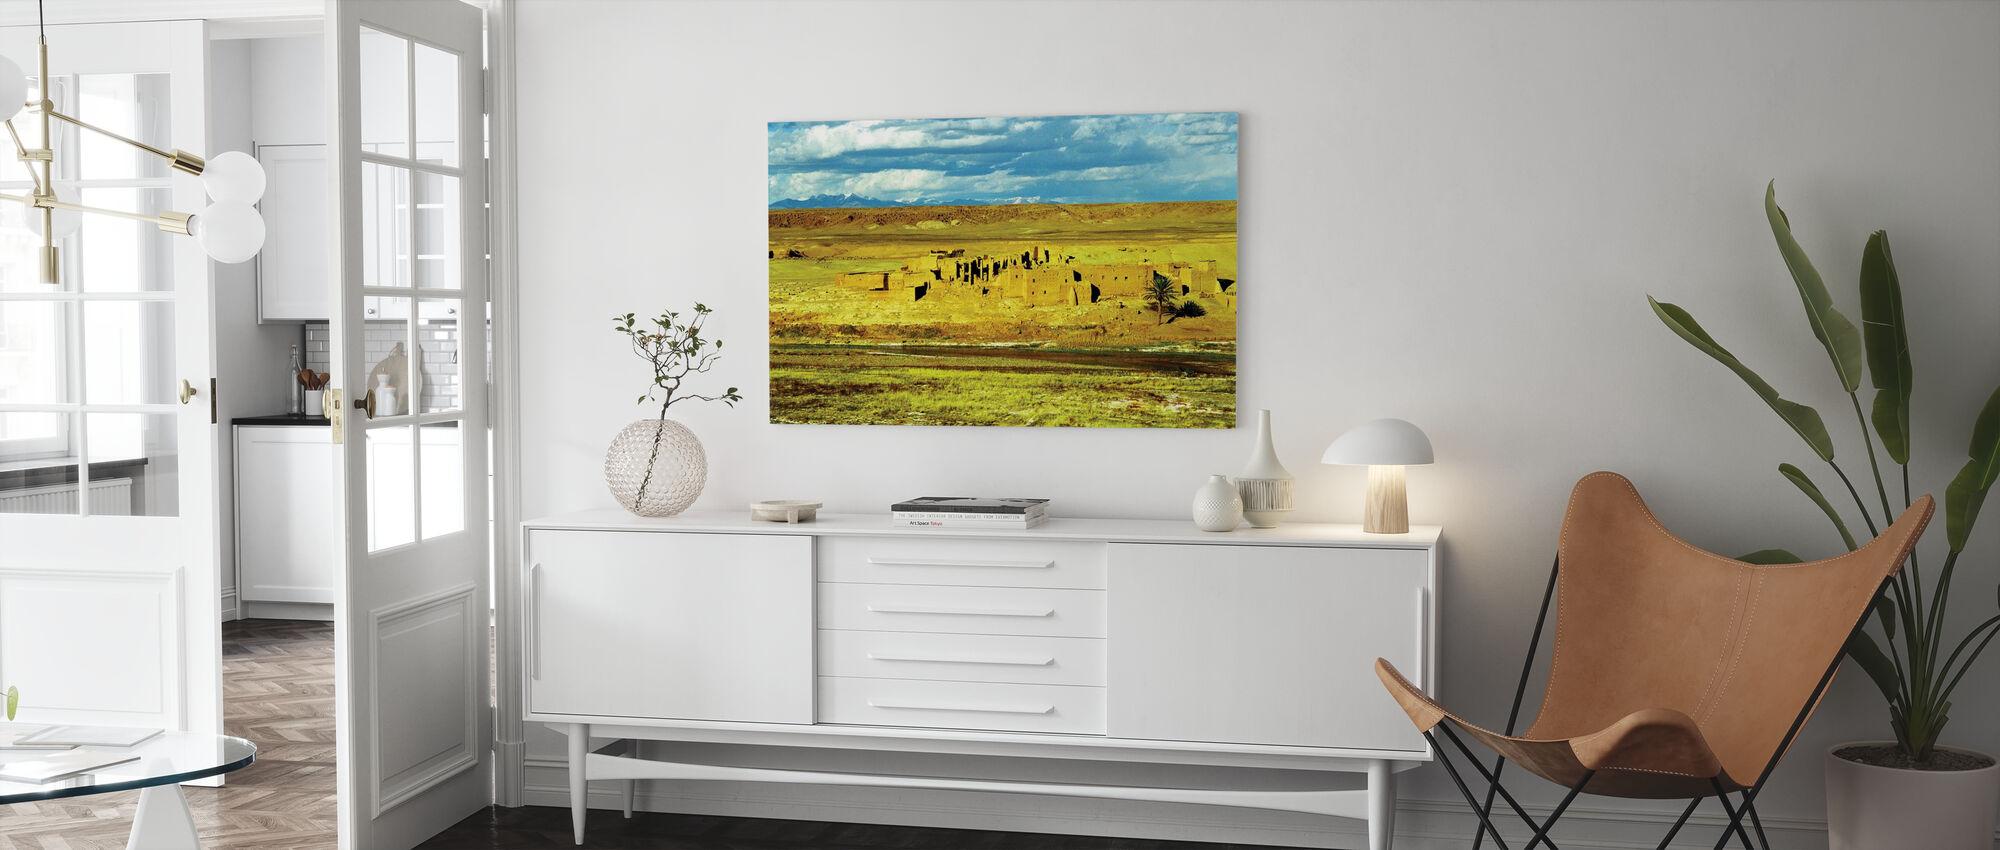 Lege stad - Canvas print - Woonkamer